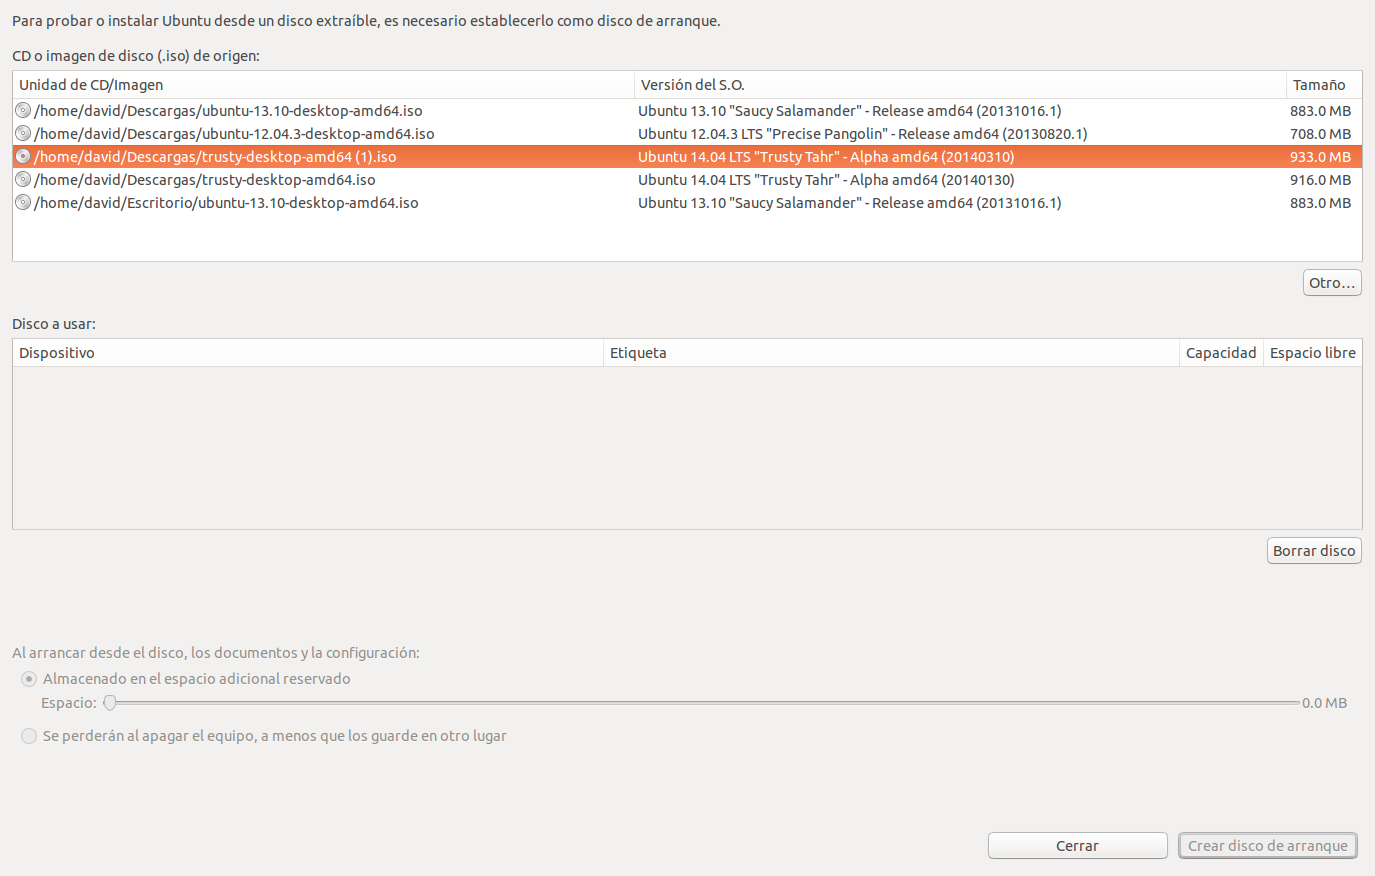 Crear USB live para instalar Ubuntu 14.04 LTS, instalar ubuntu en un pendrive